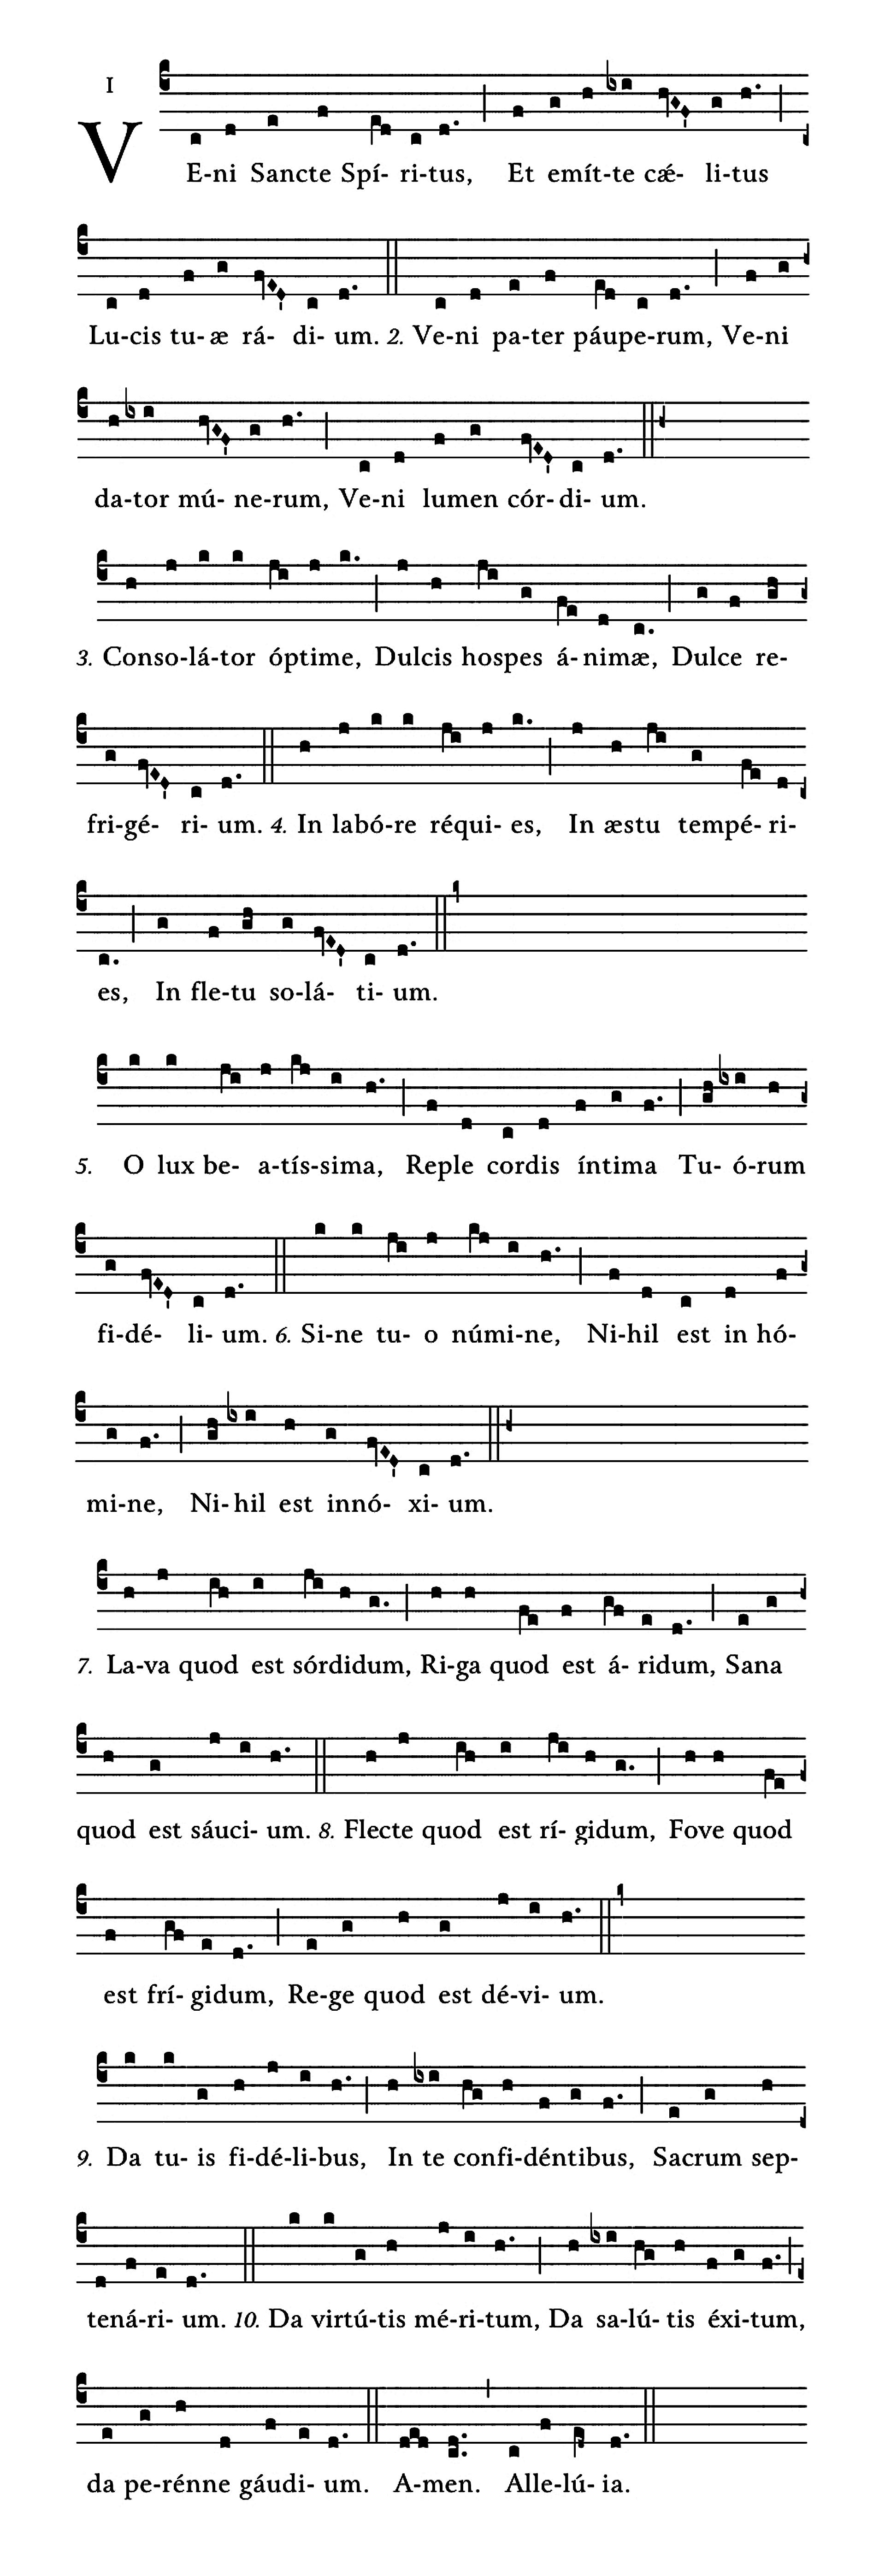 Veni Sancte Spiritus - notation